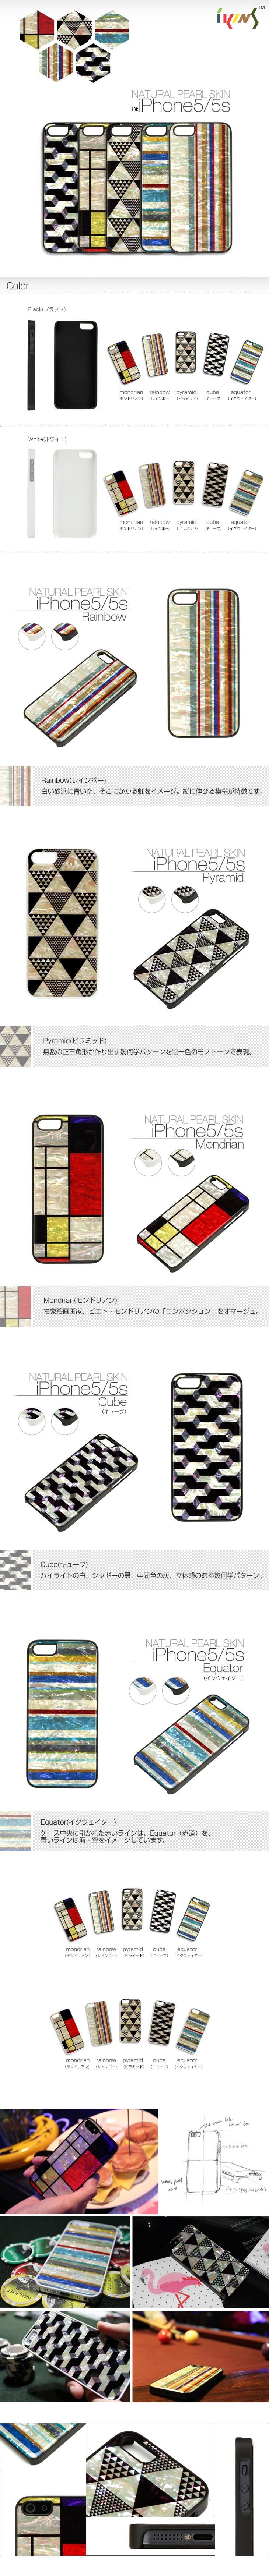 iPhoneNaturalPearlCase(ナチュラルパールケース)